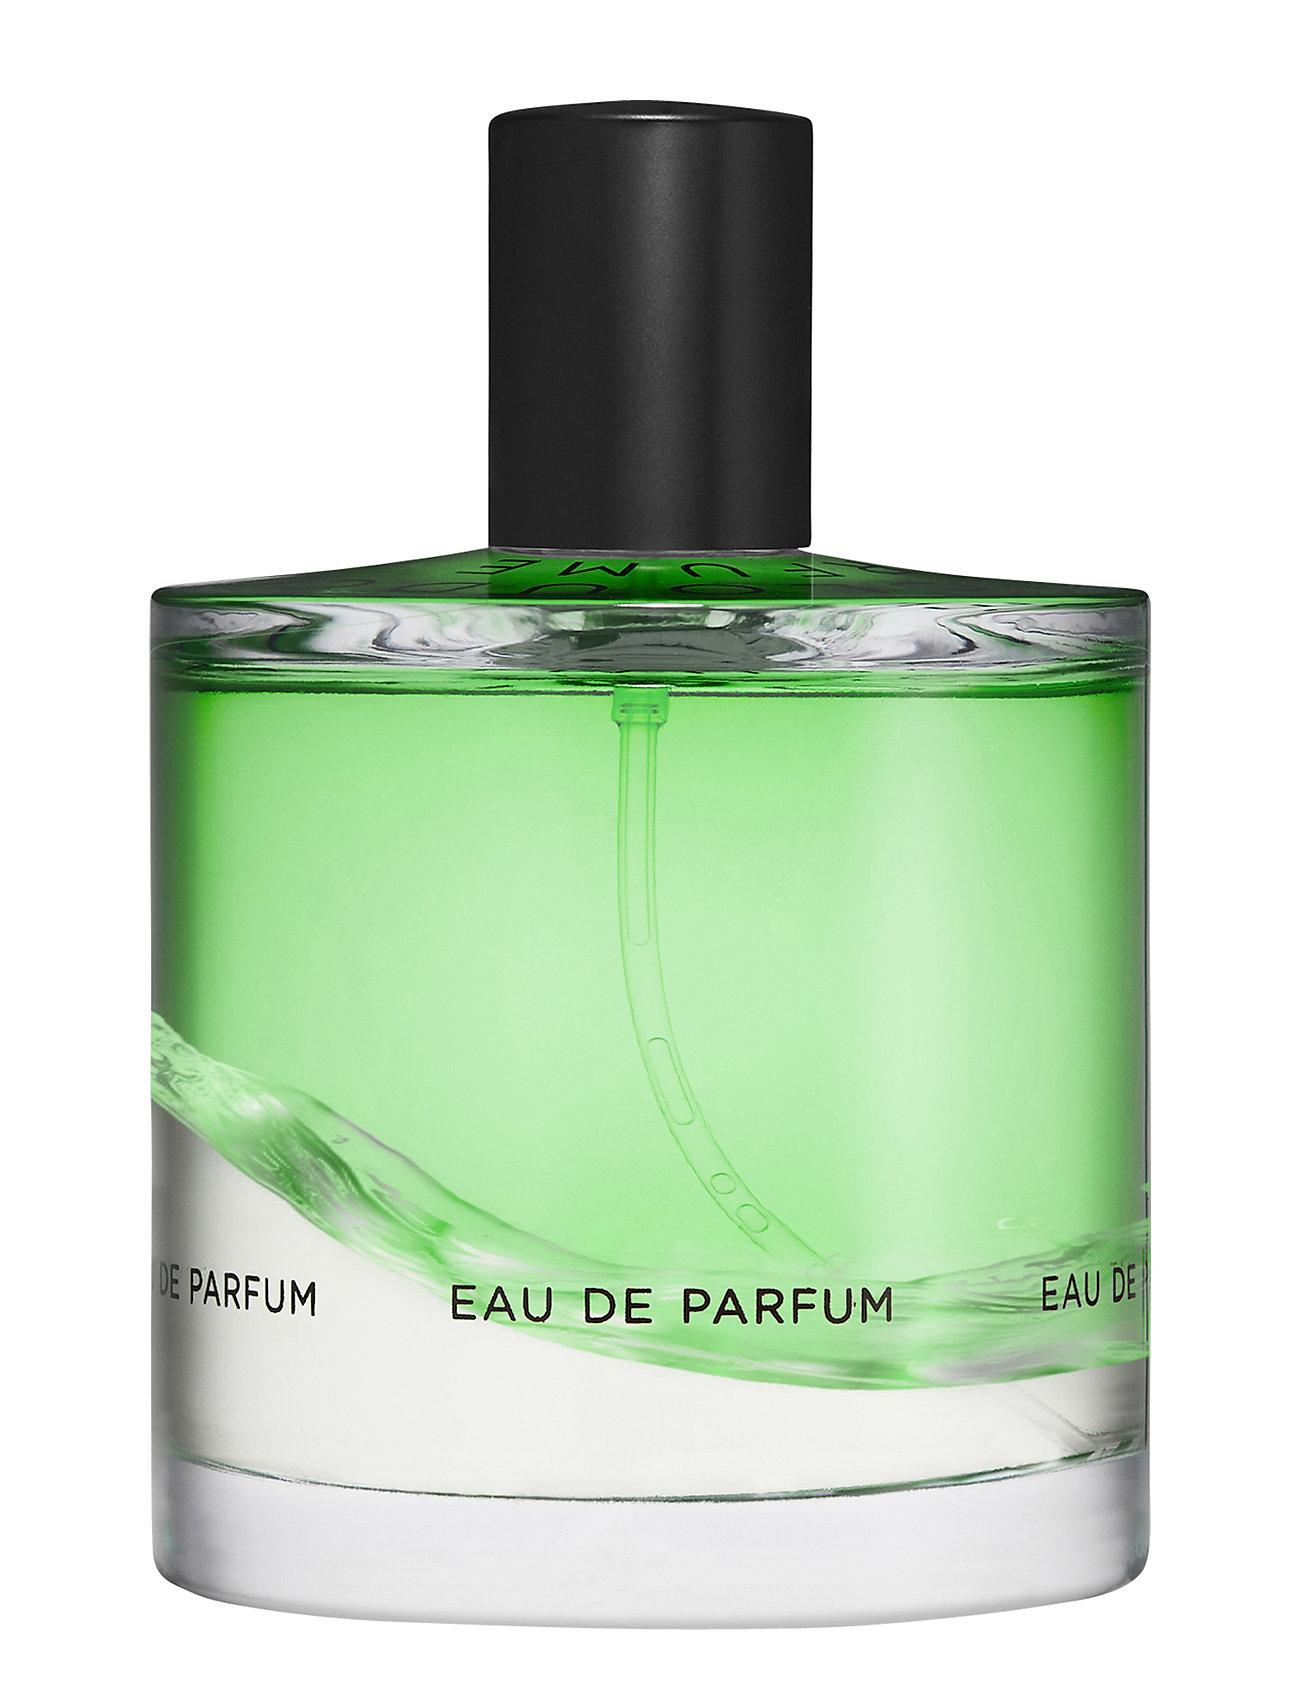 Zarkoperfume Cloud Collection 3 Eau de Parfum - CLEAR